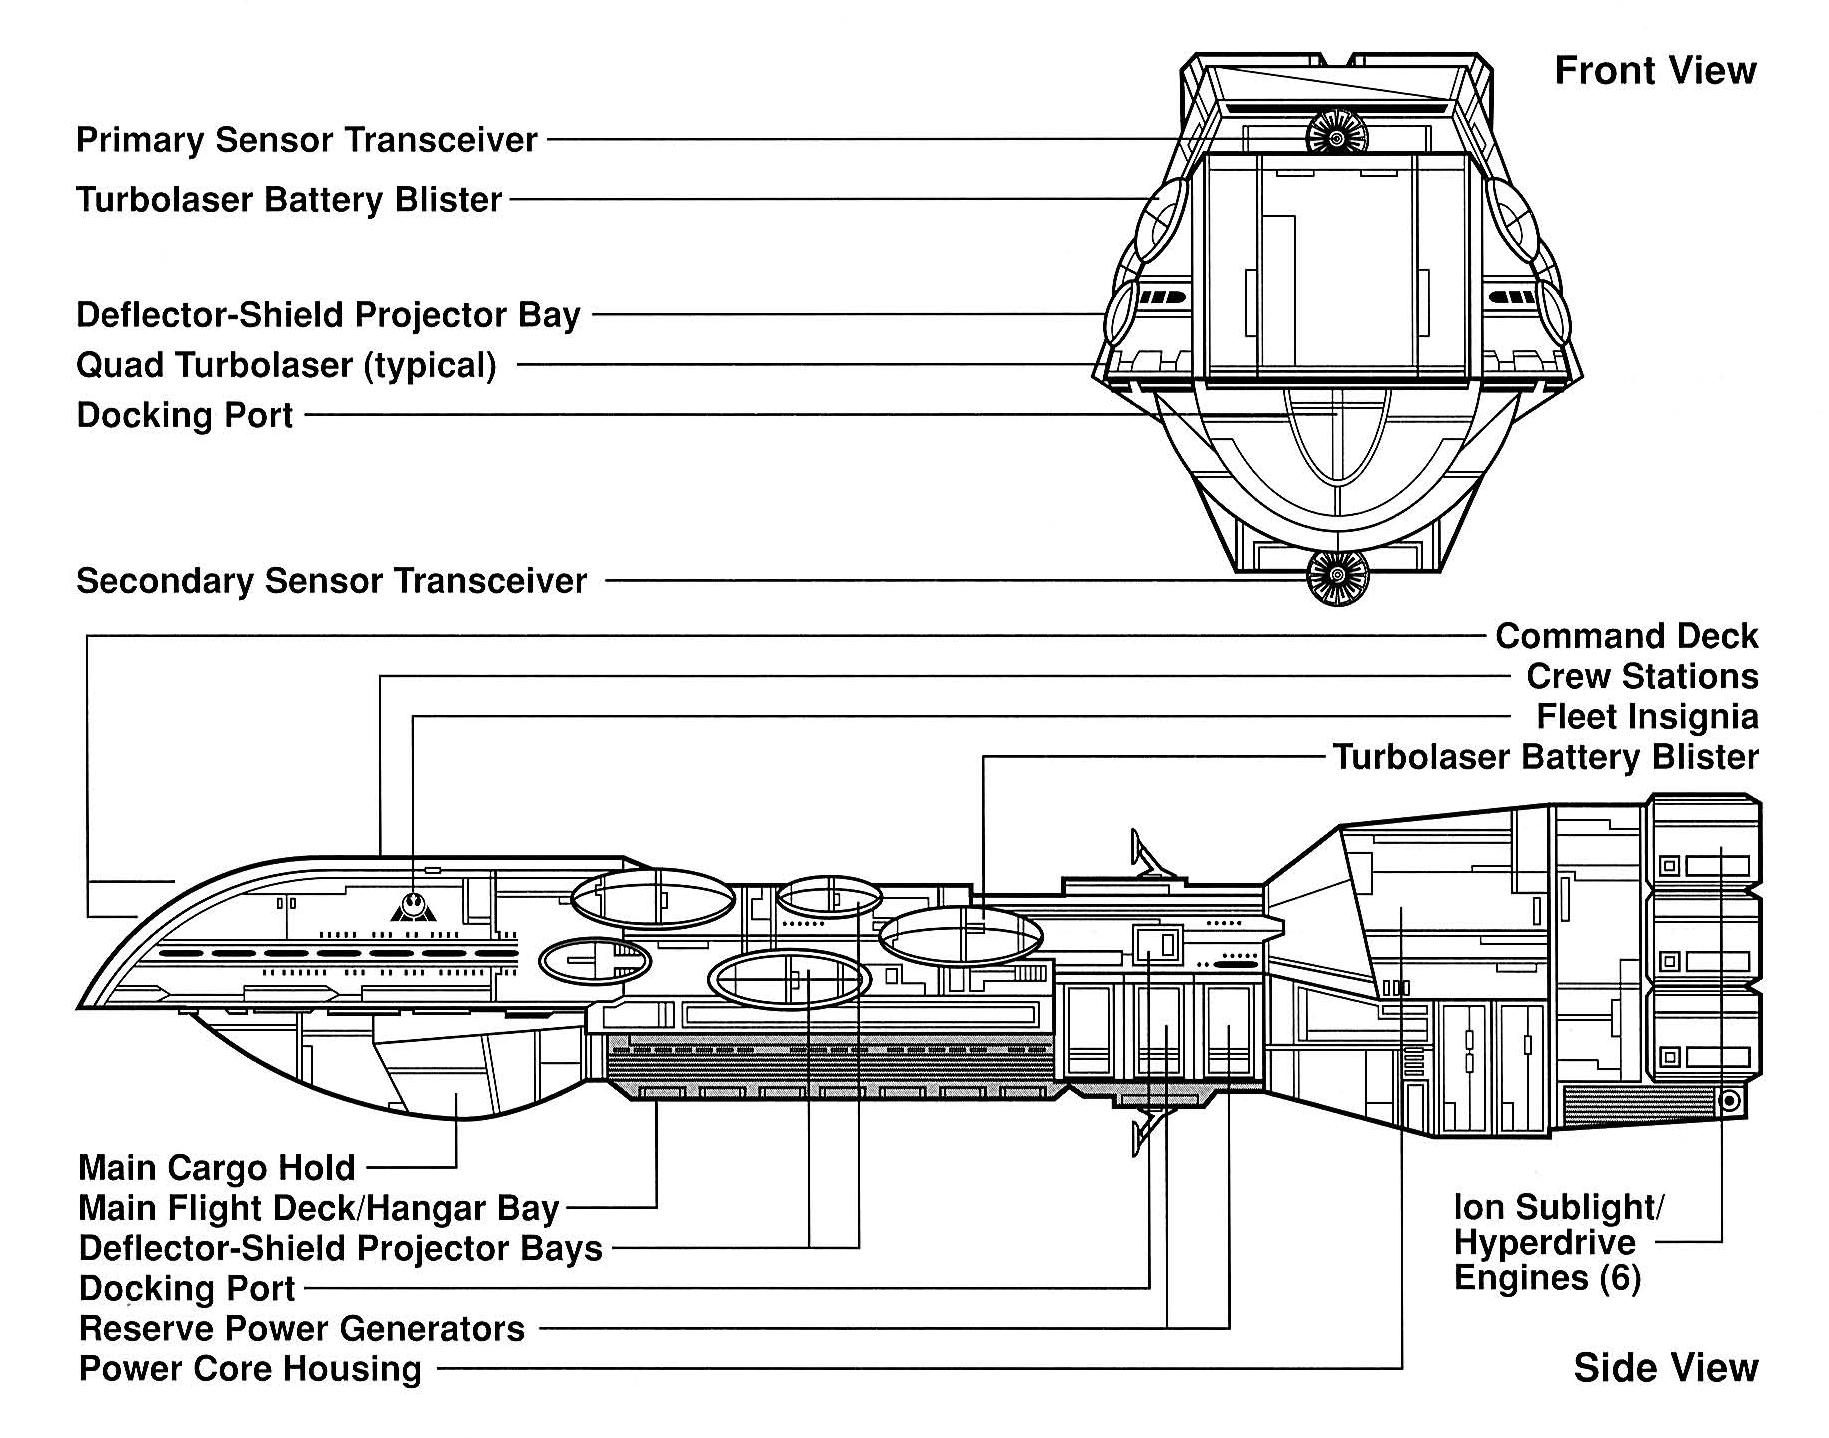 Minecraft Star Wars Ship Schematics Hyperdrive Wiring Diagram V Diagrams U2022 Rh Seniorlivinguniversity Co Book